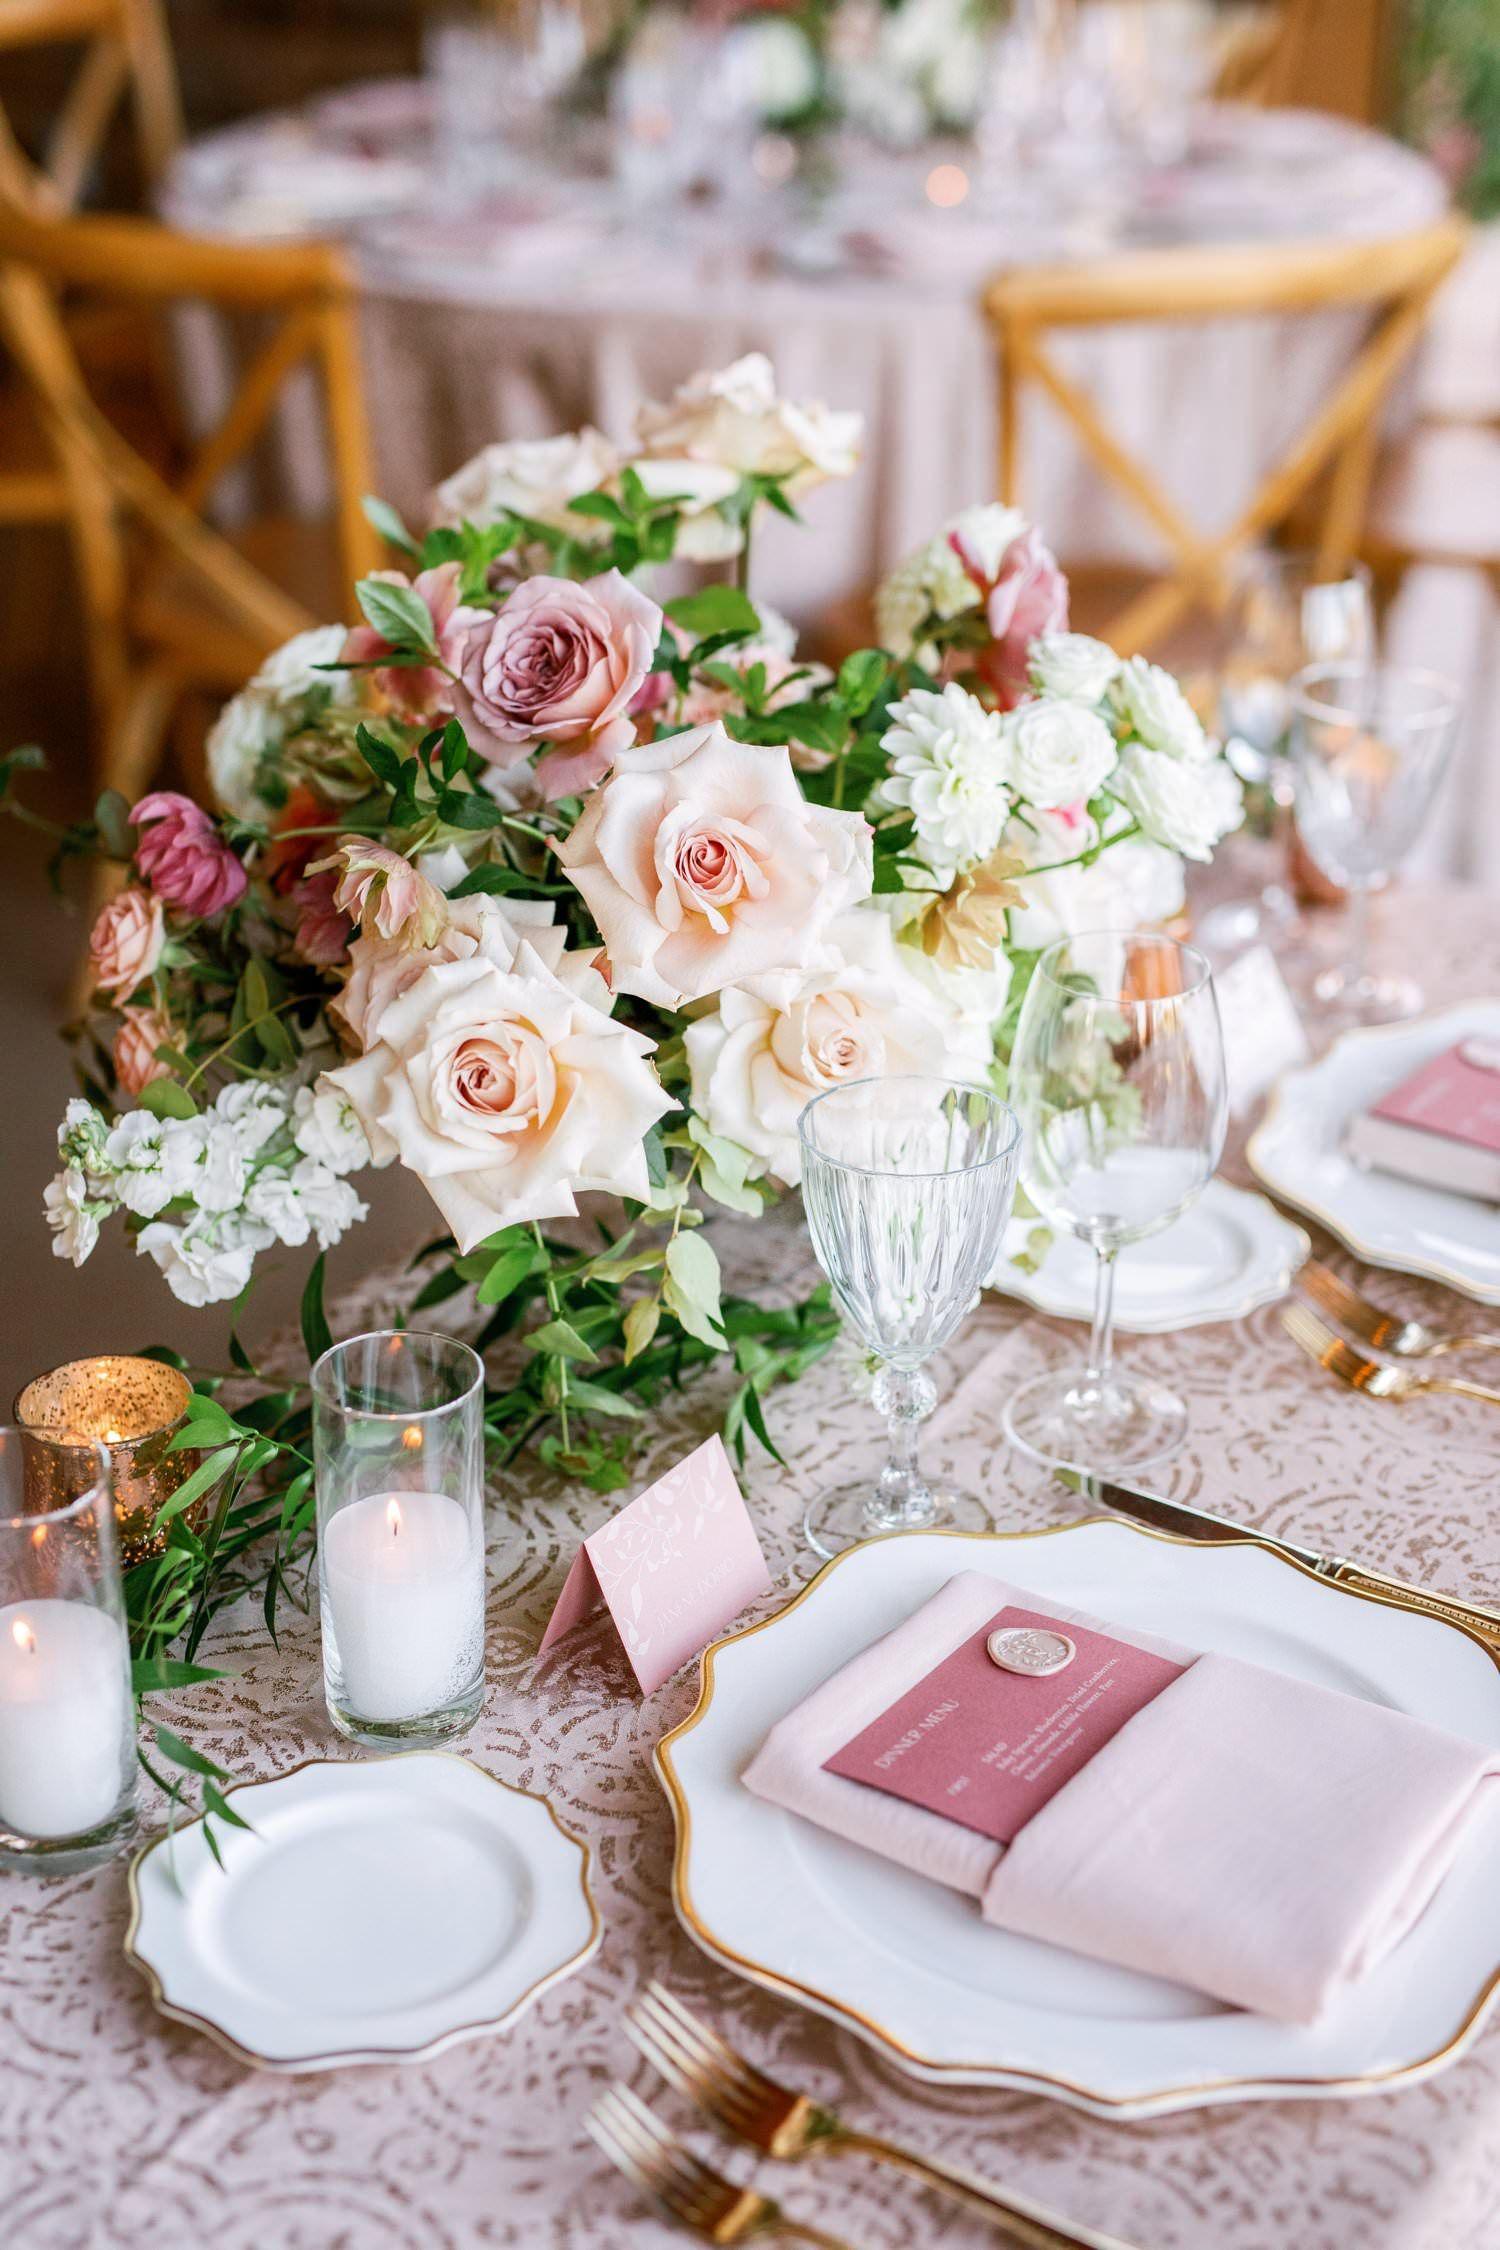 Santa Barbara Wedding Linen Rentals Anna Delores In 2020 Wedding Table Linens Wedding Linen Rental Wedding Linens